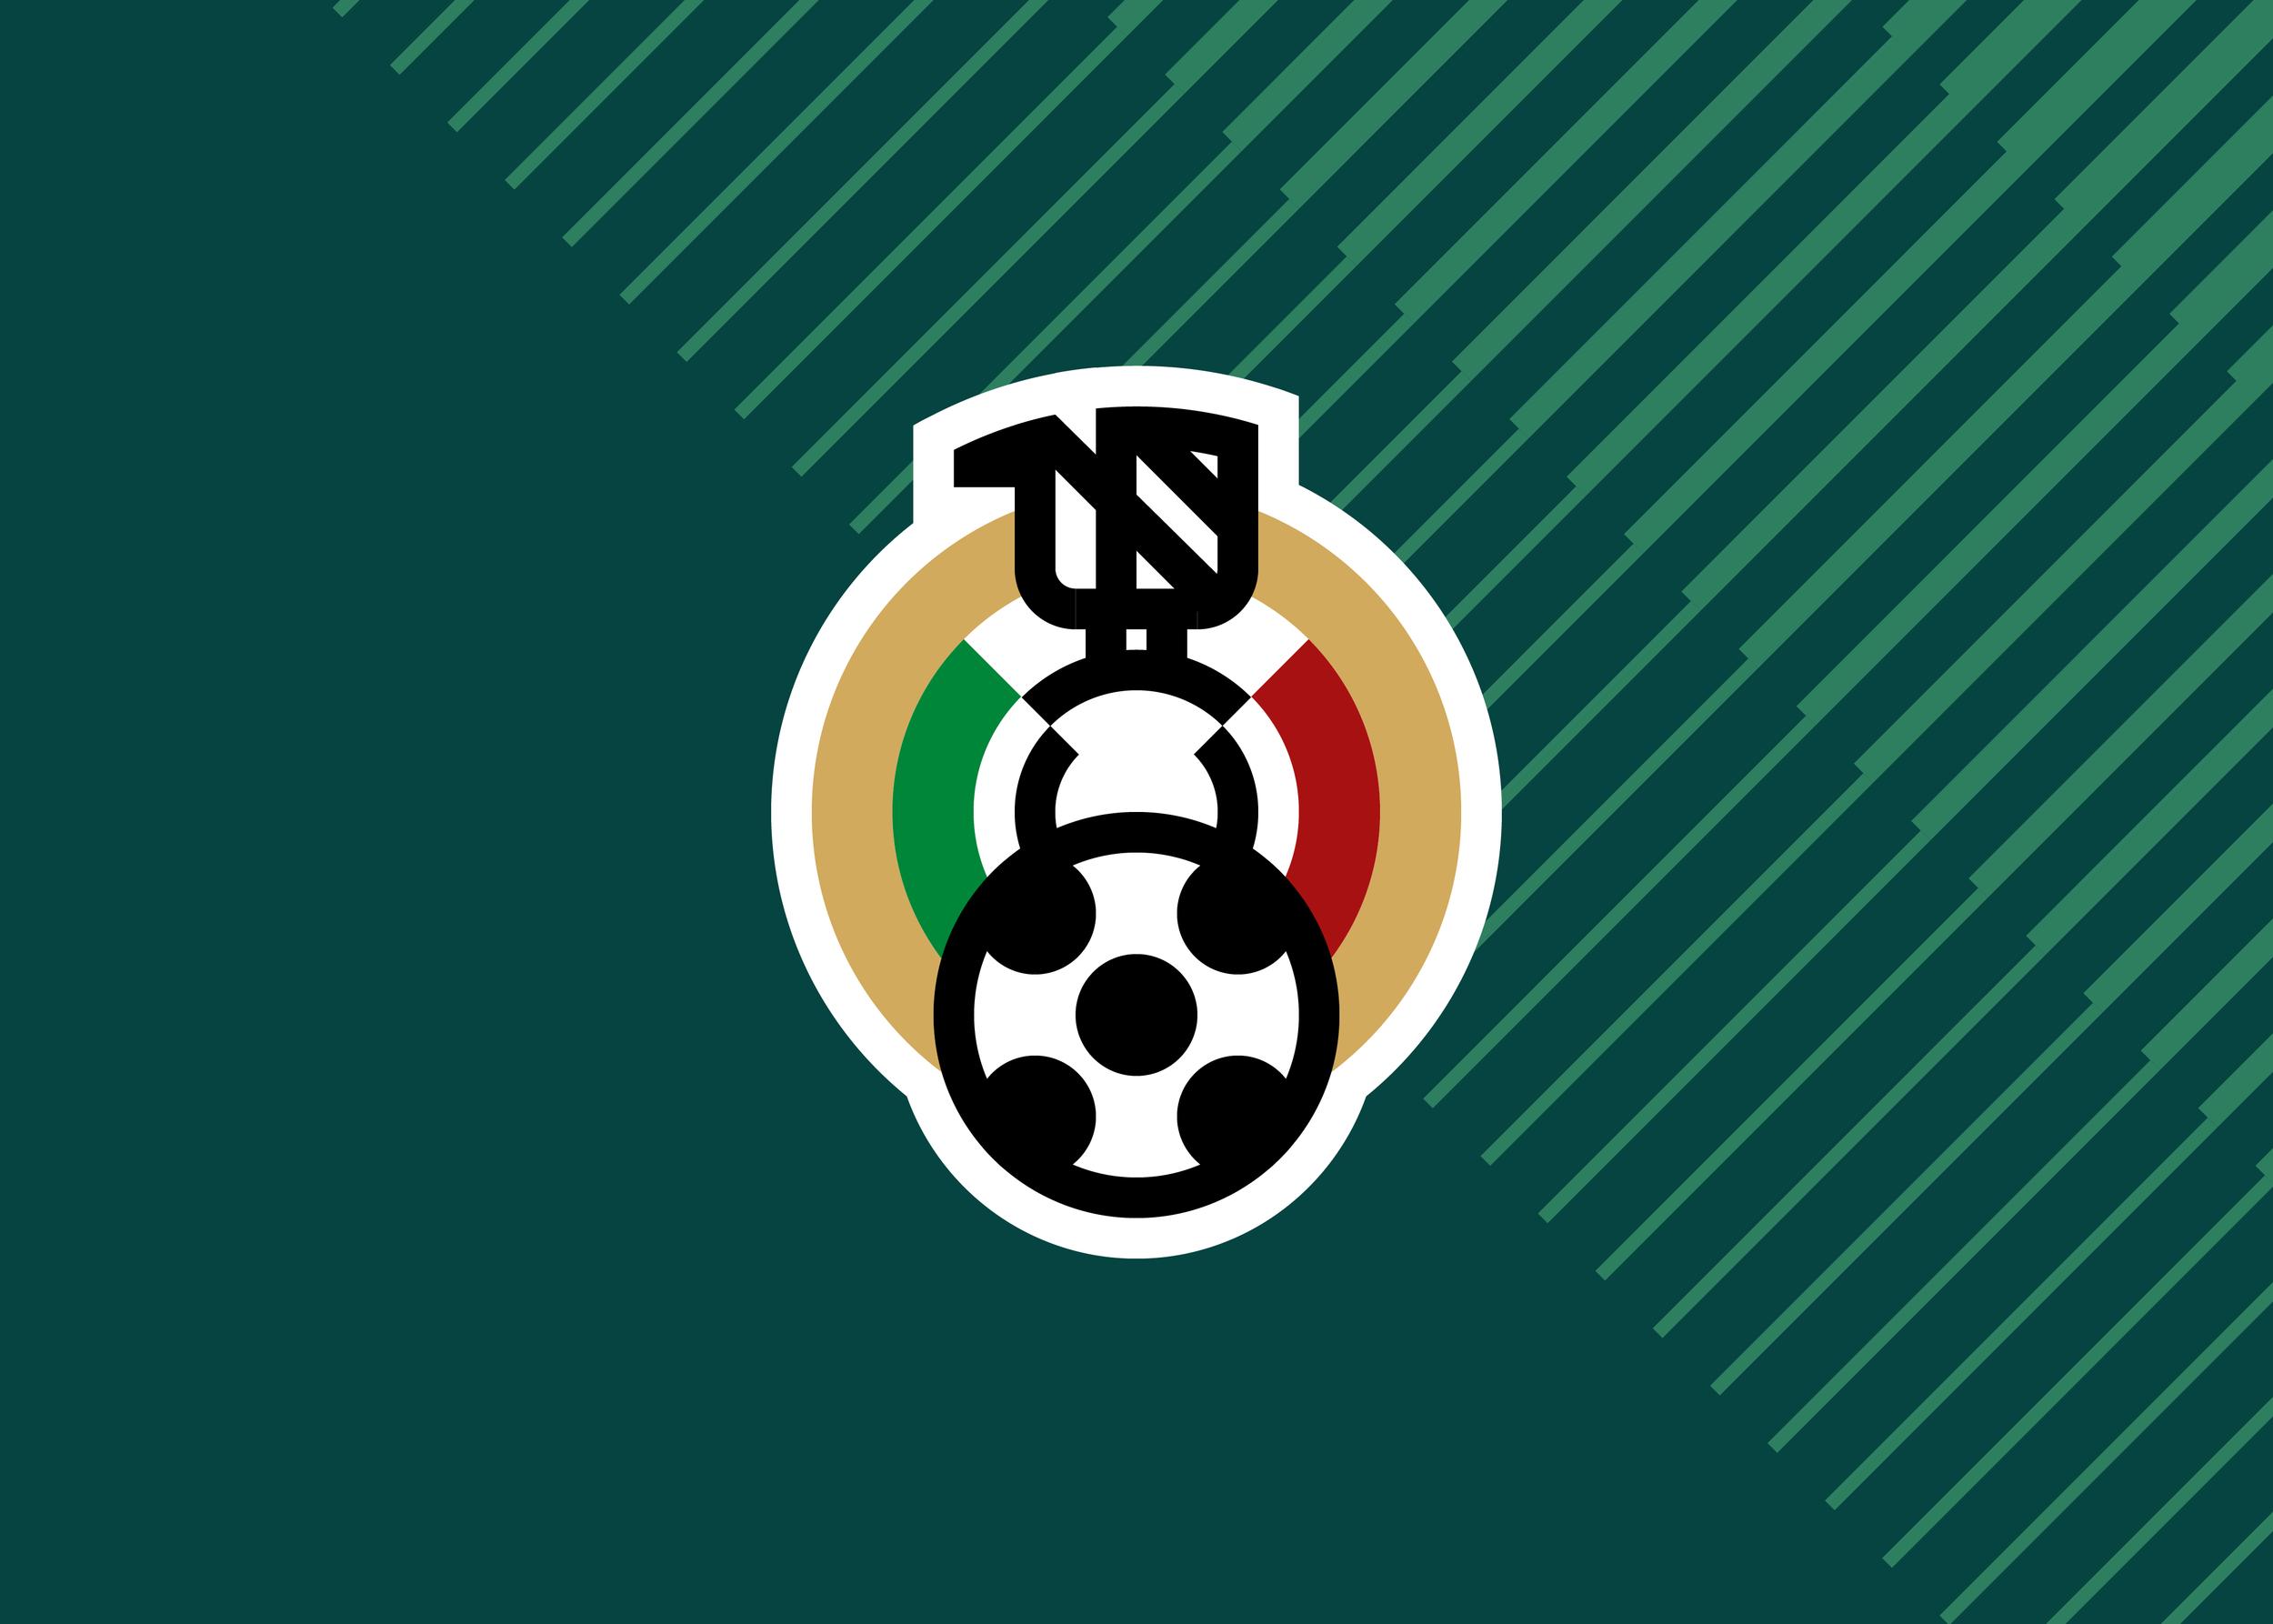 Mexico-Geometric-World-Cup-Football-Badge-01-Logo-Design-Freelance-Kent.png